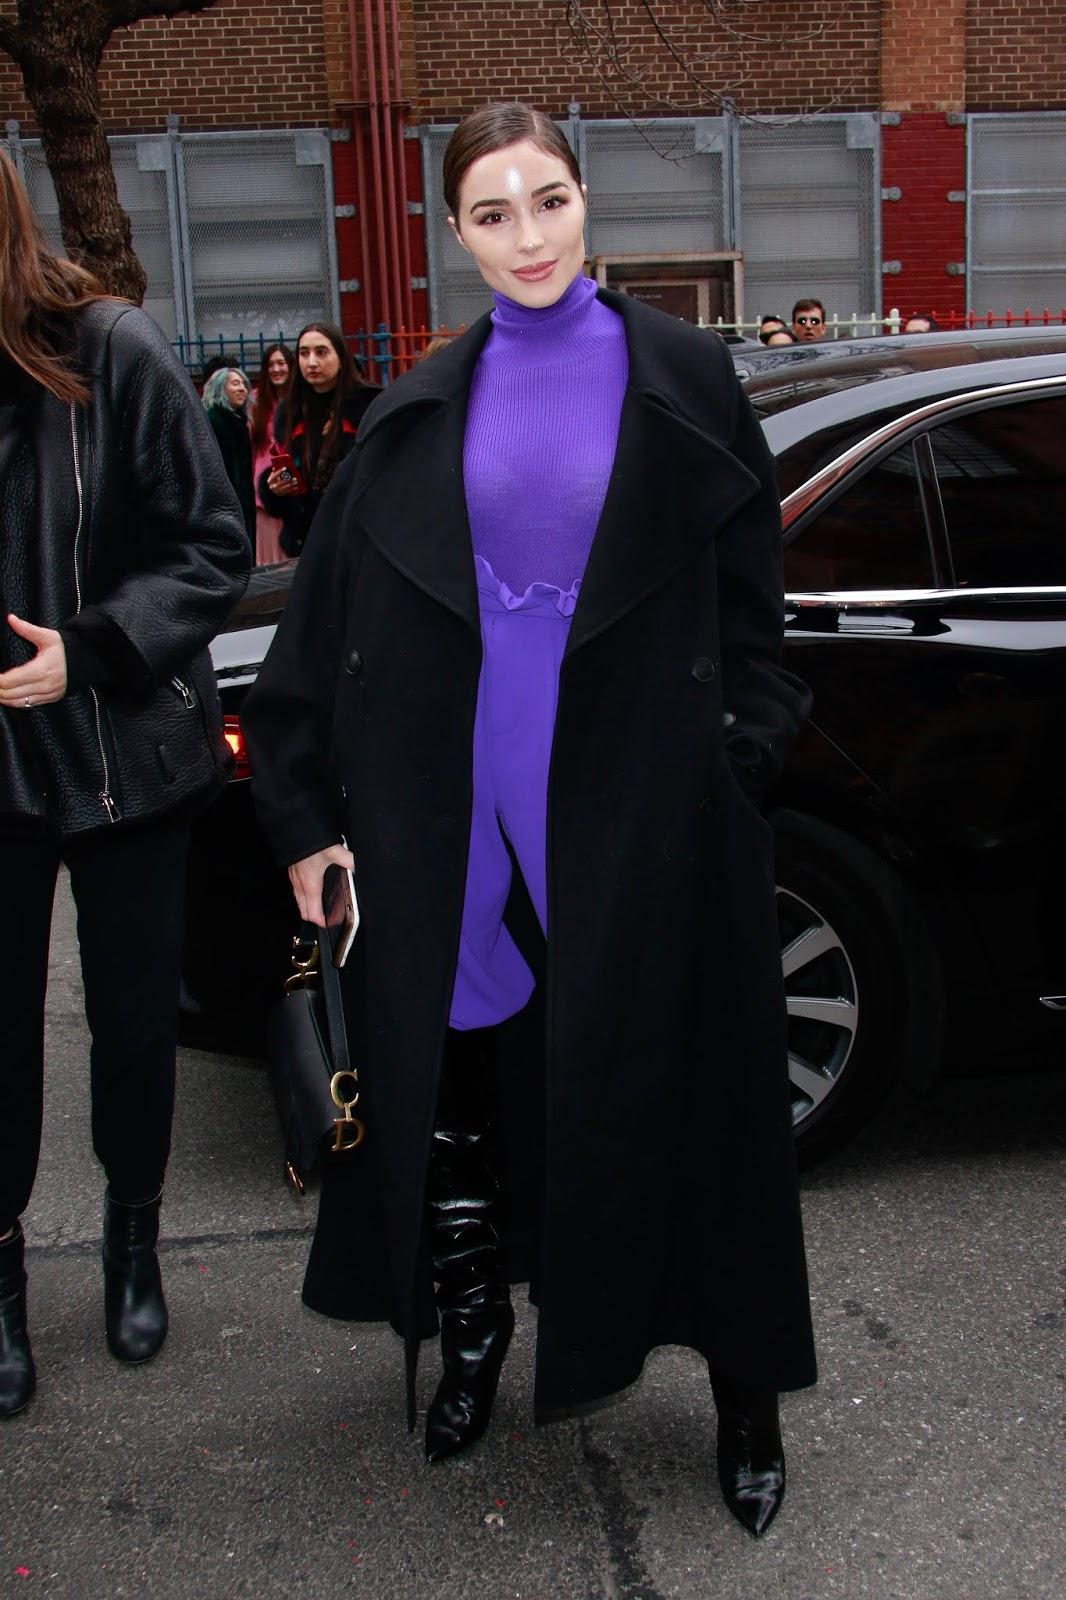 Olivia Culpo - Outside Alice + Olivia fashion show during NYFW in NYC February 11, 2019